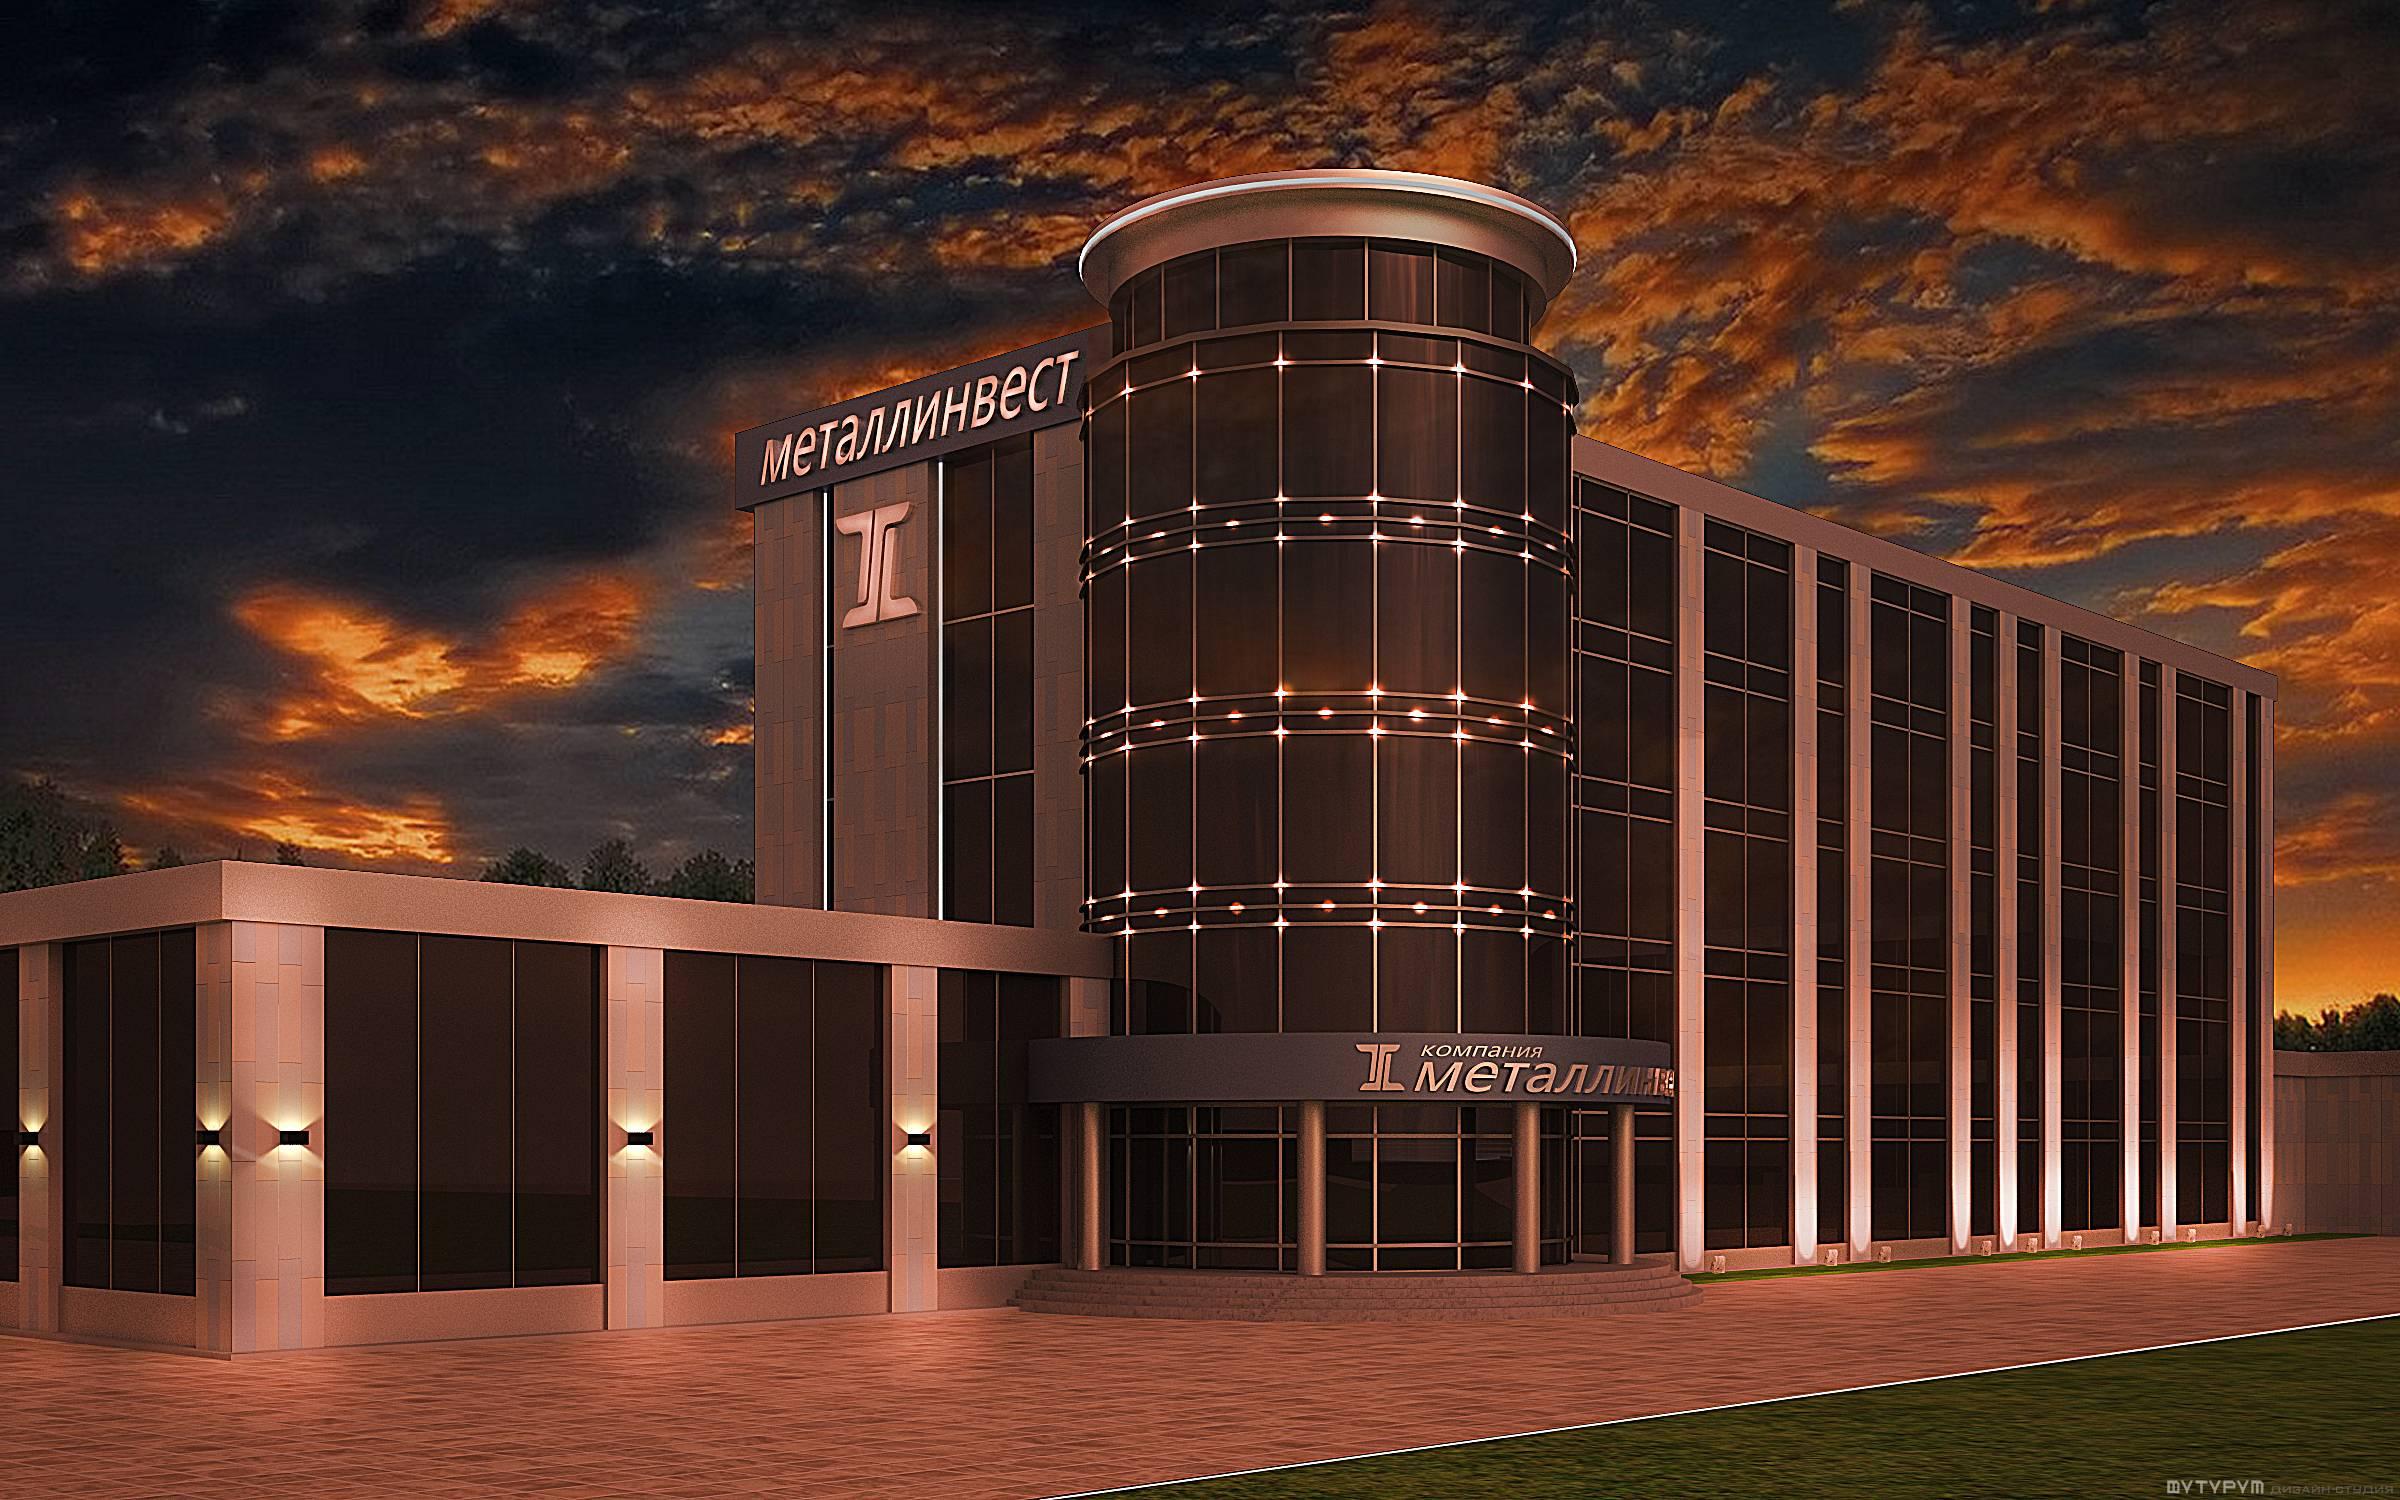 Дизайн концепции фасада бизнес-центра Металлинвест